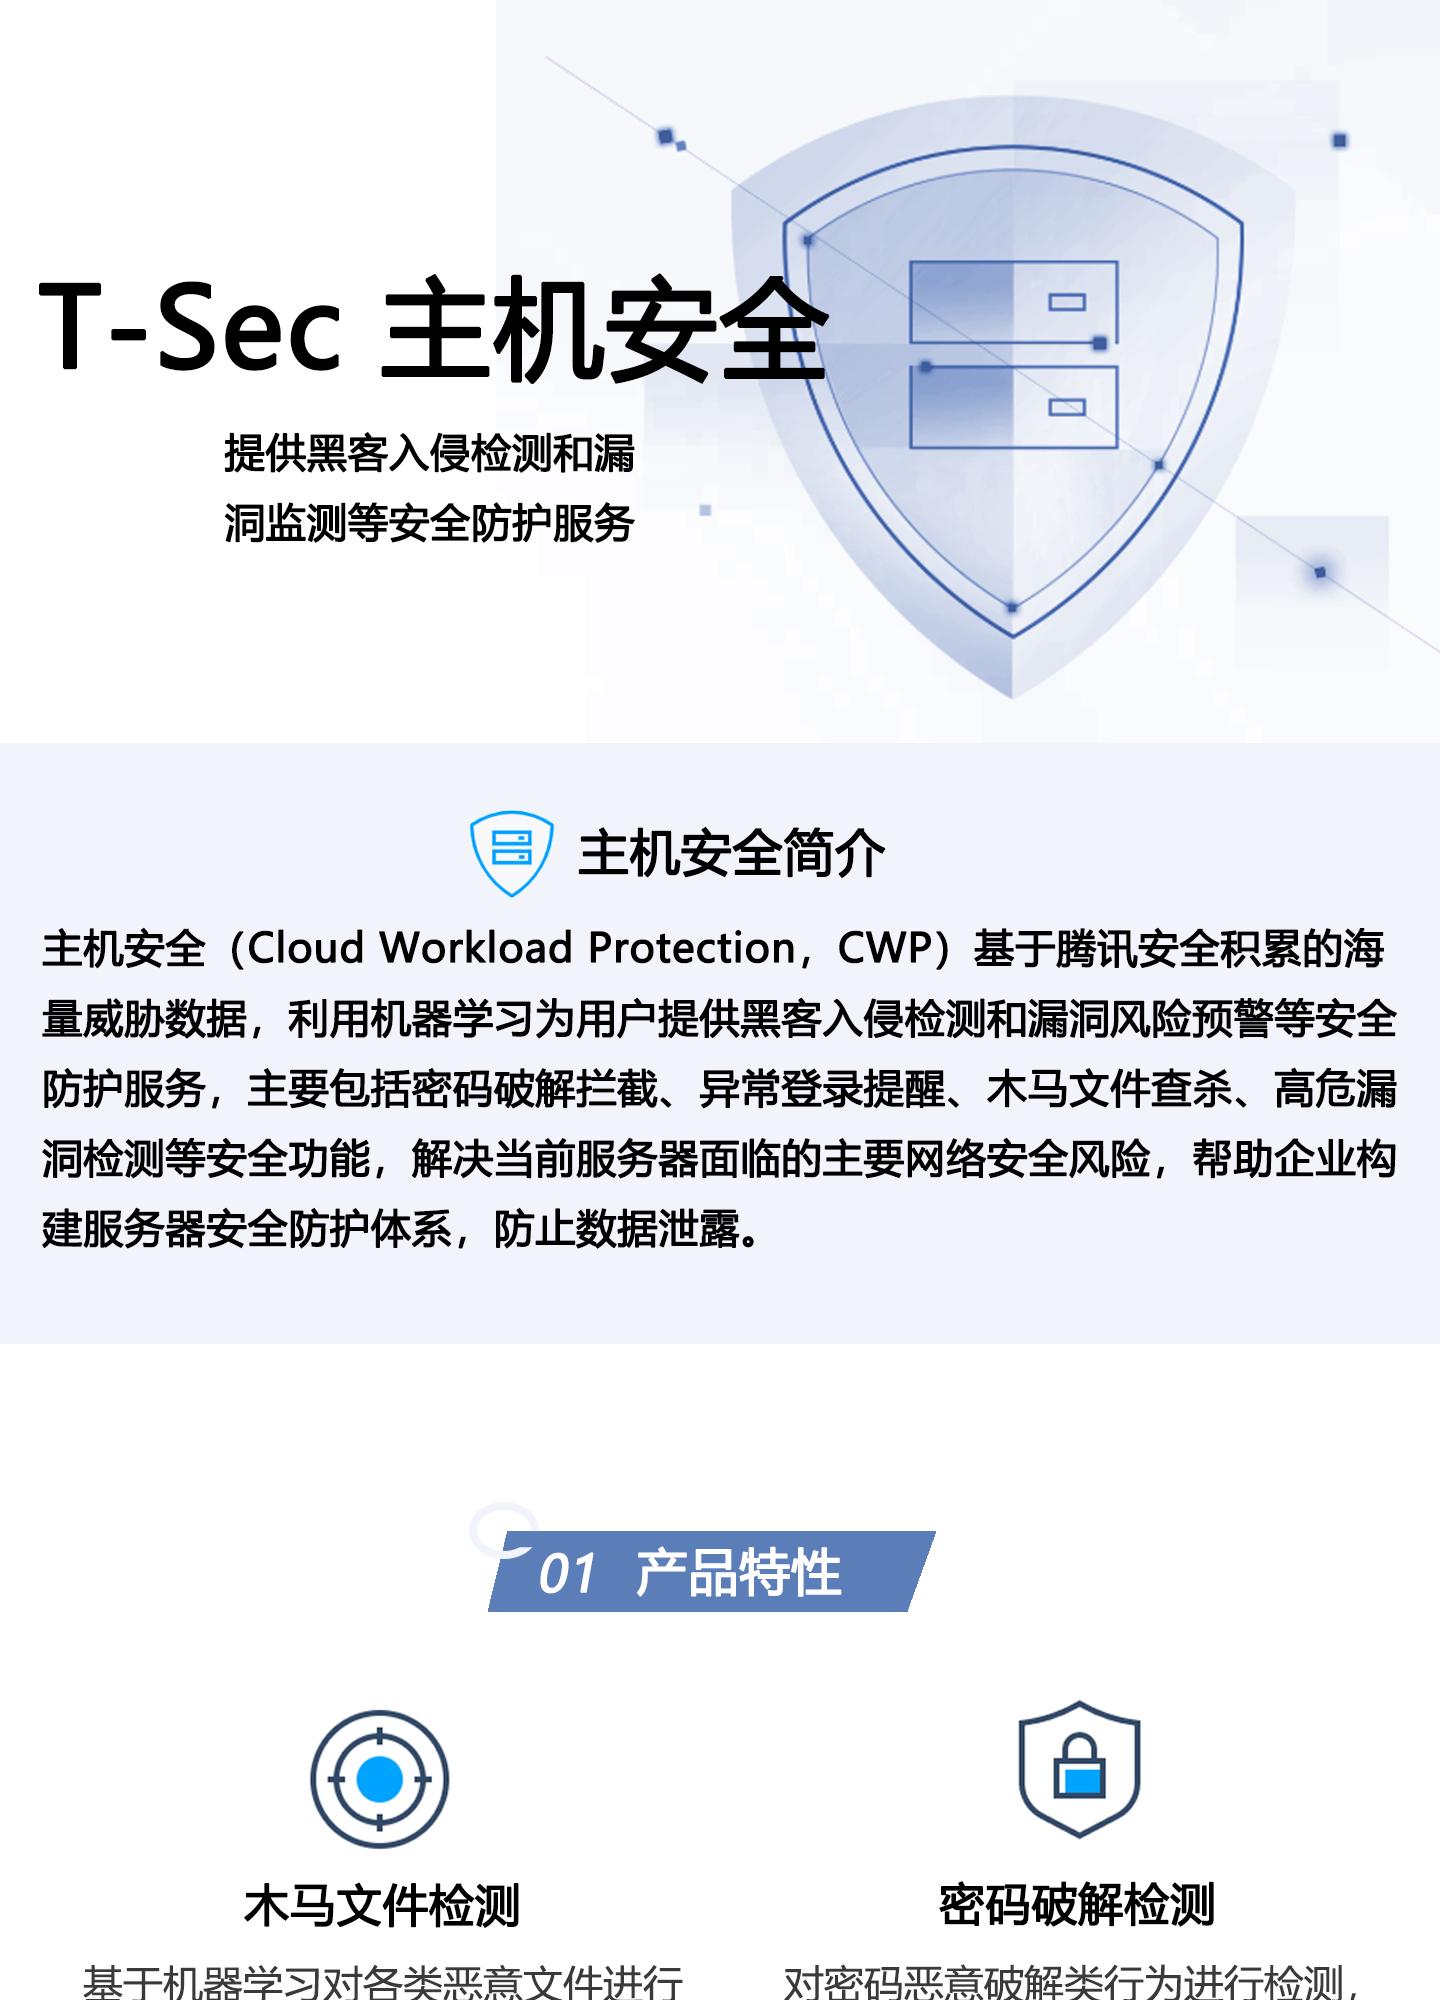 T-Sec主机安全1440_01.jpg